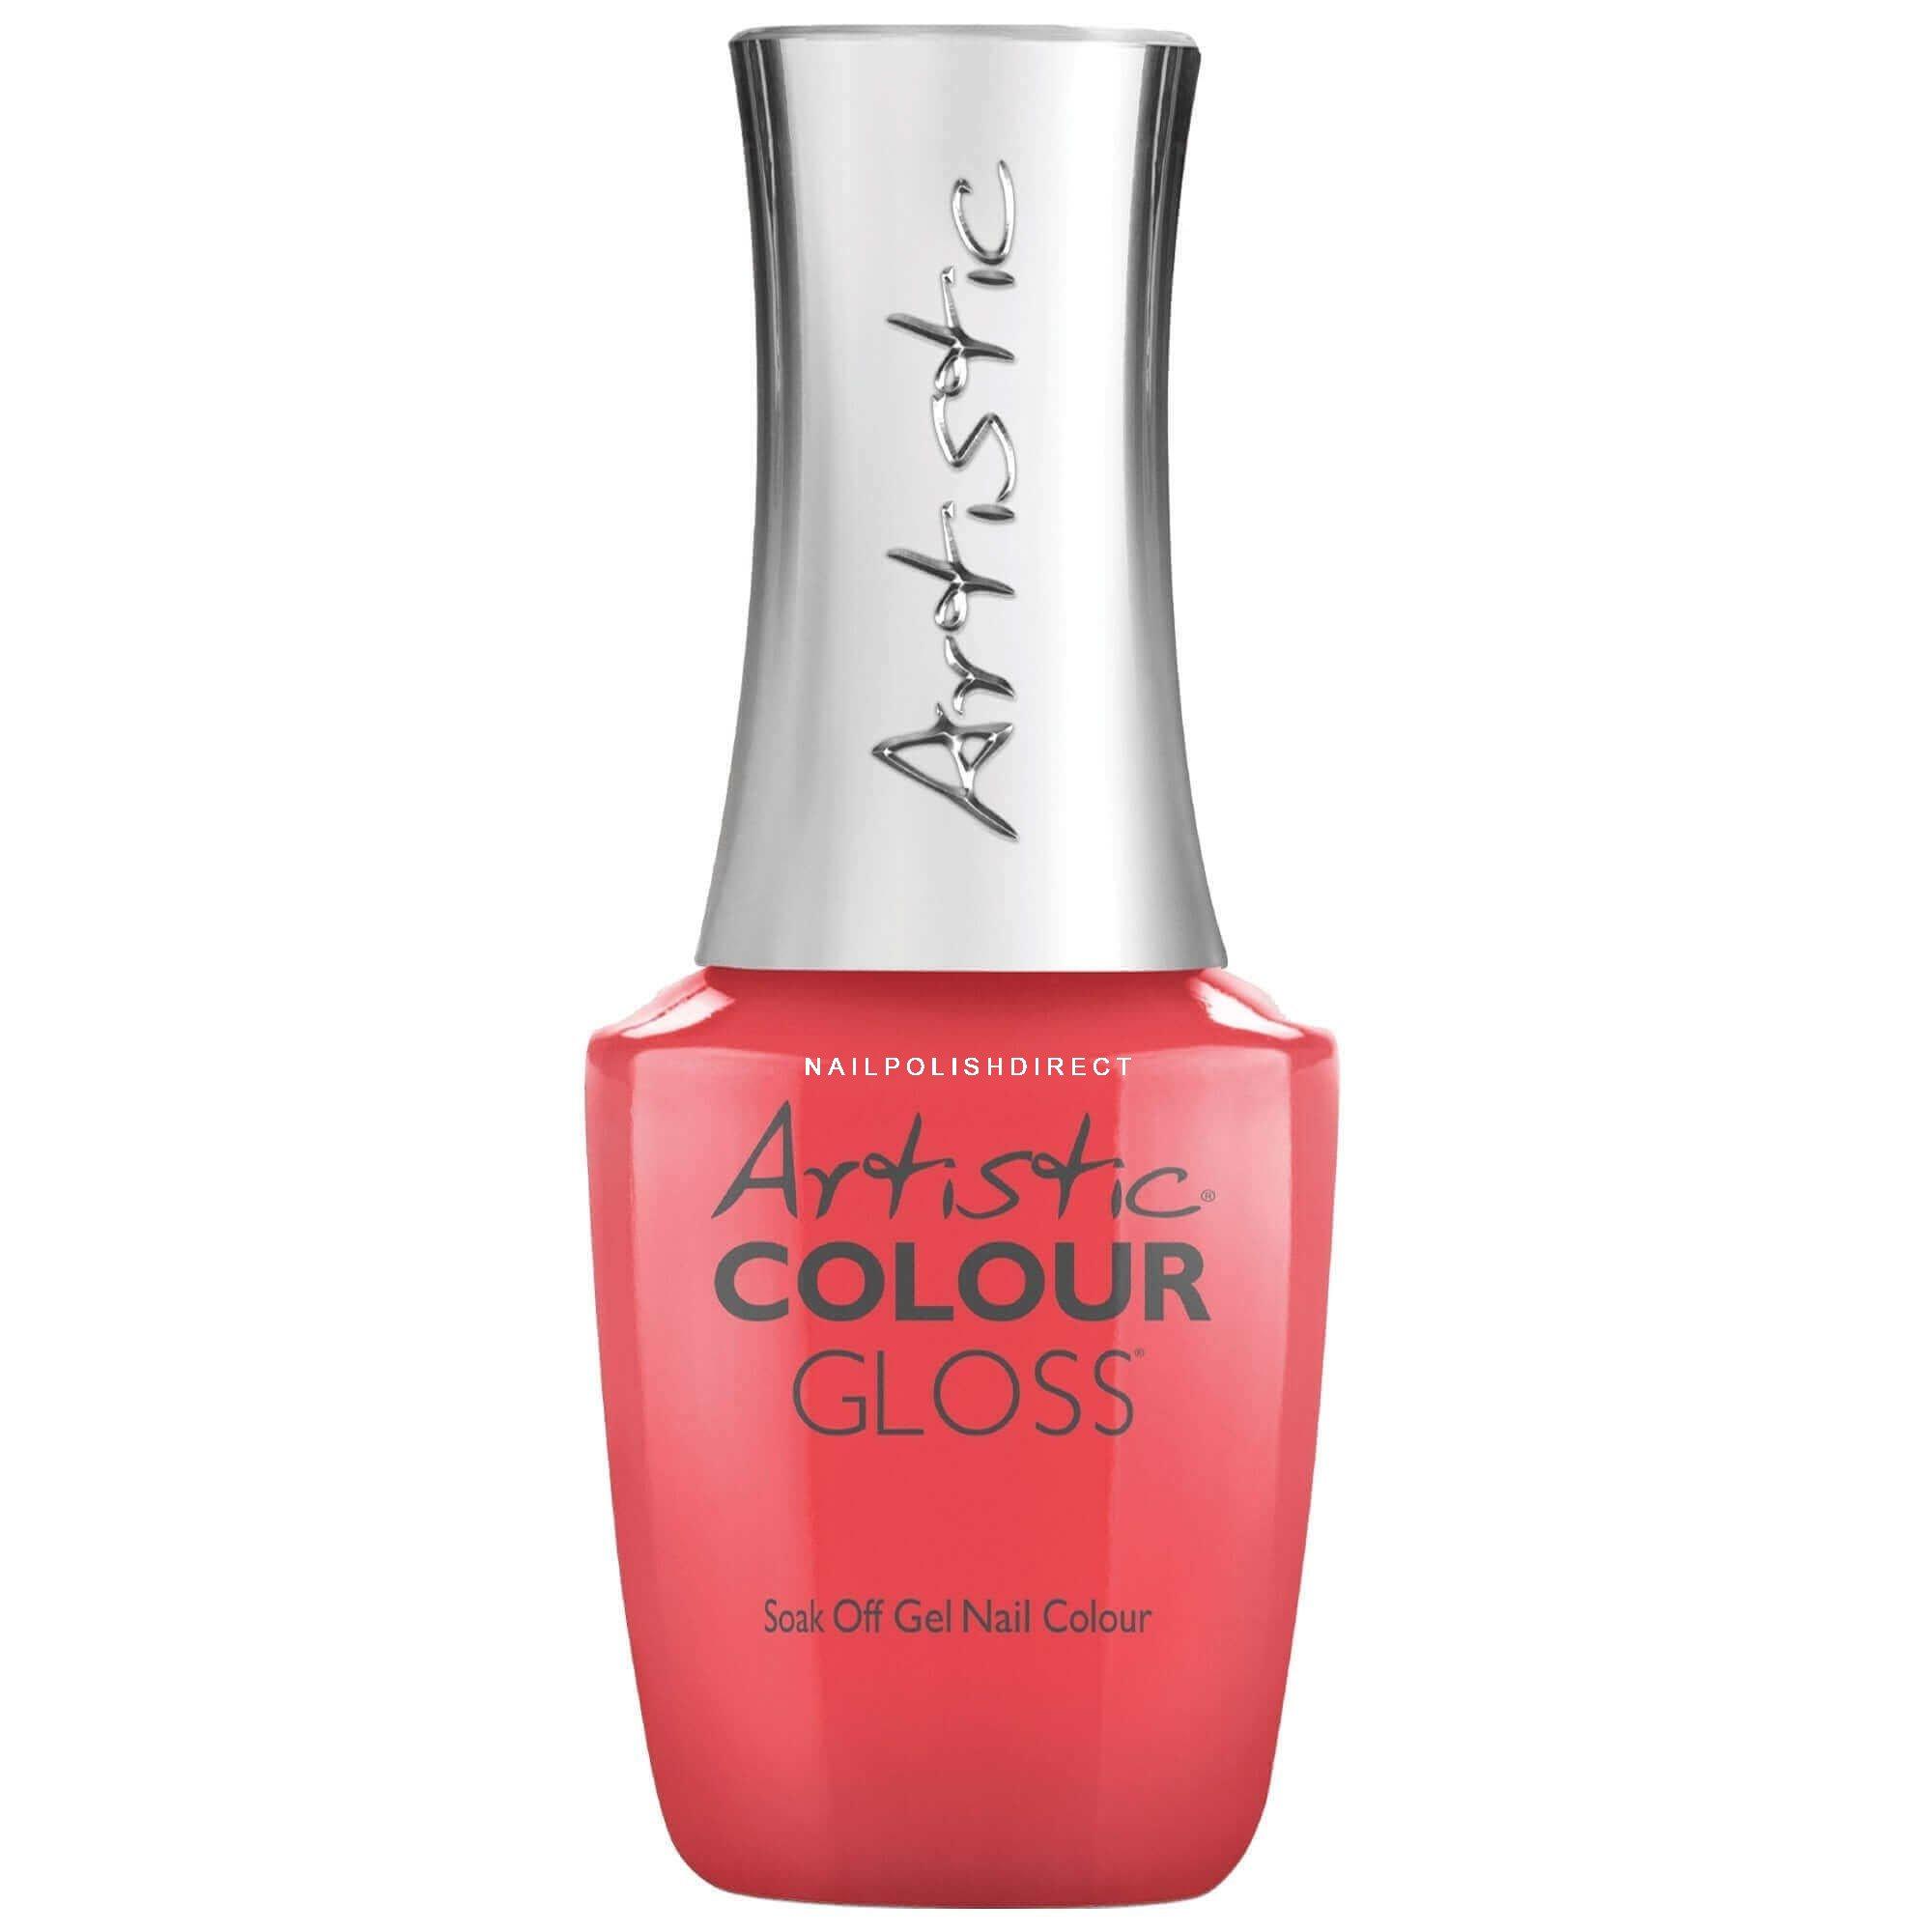 Artistic Colour Gloss Soak Off Gel Nail Polish - Owned 15mL (03063)